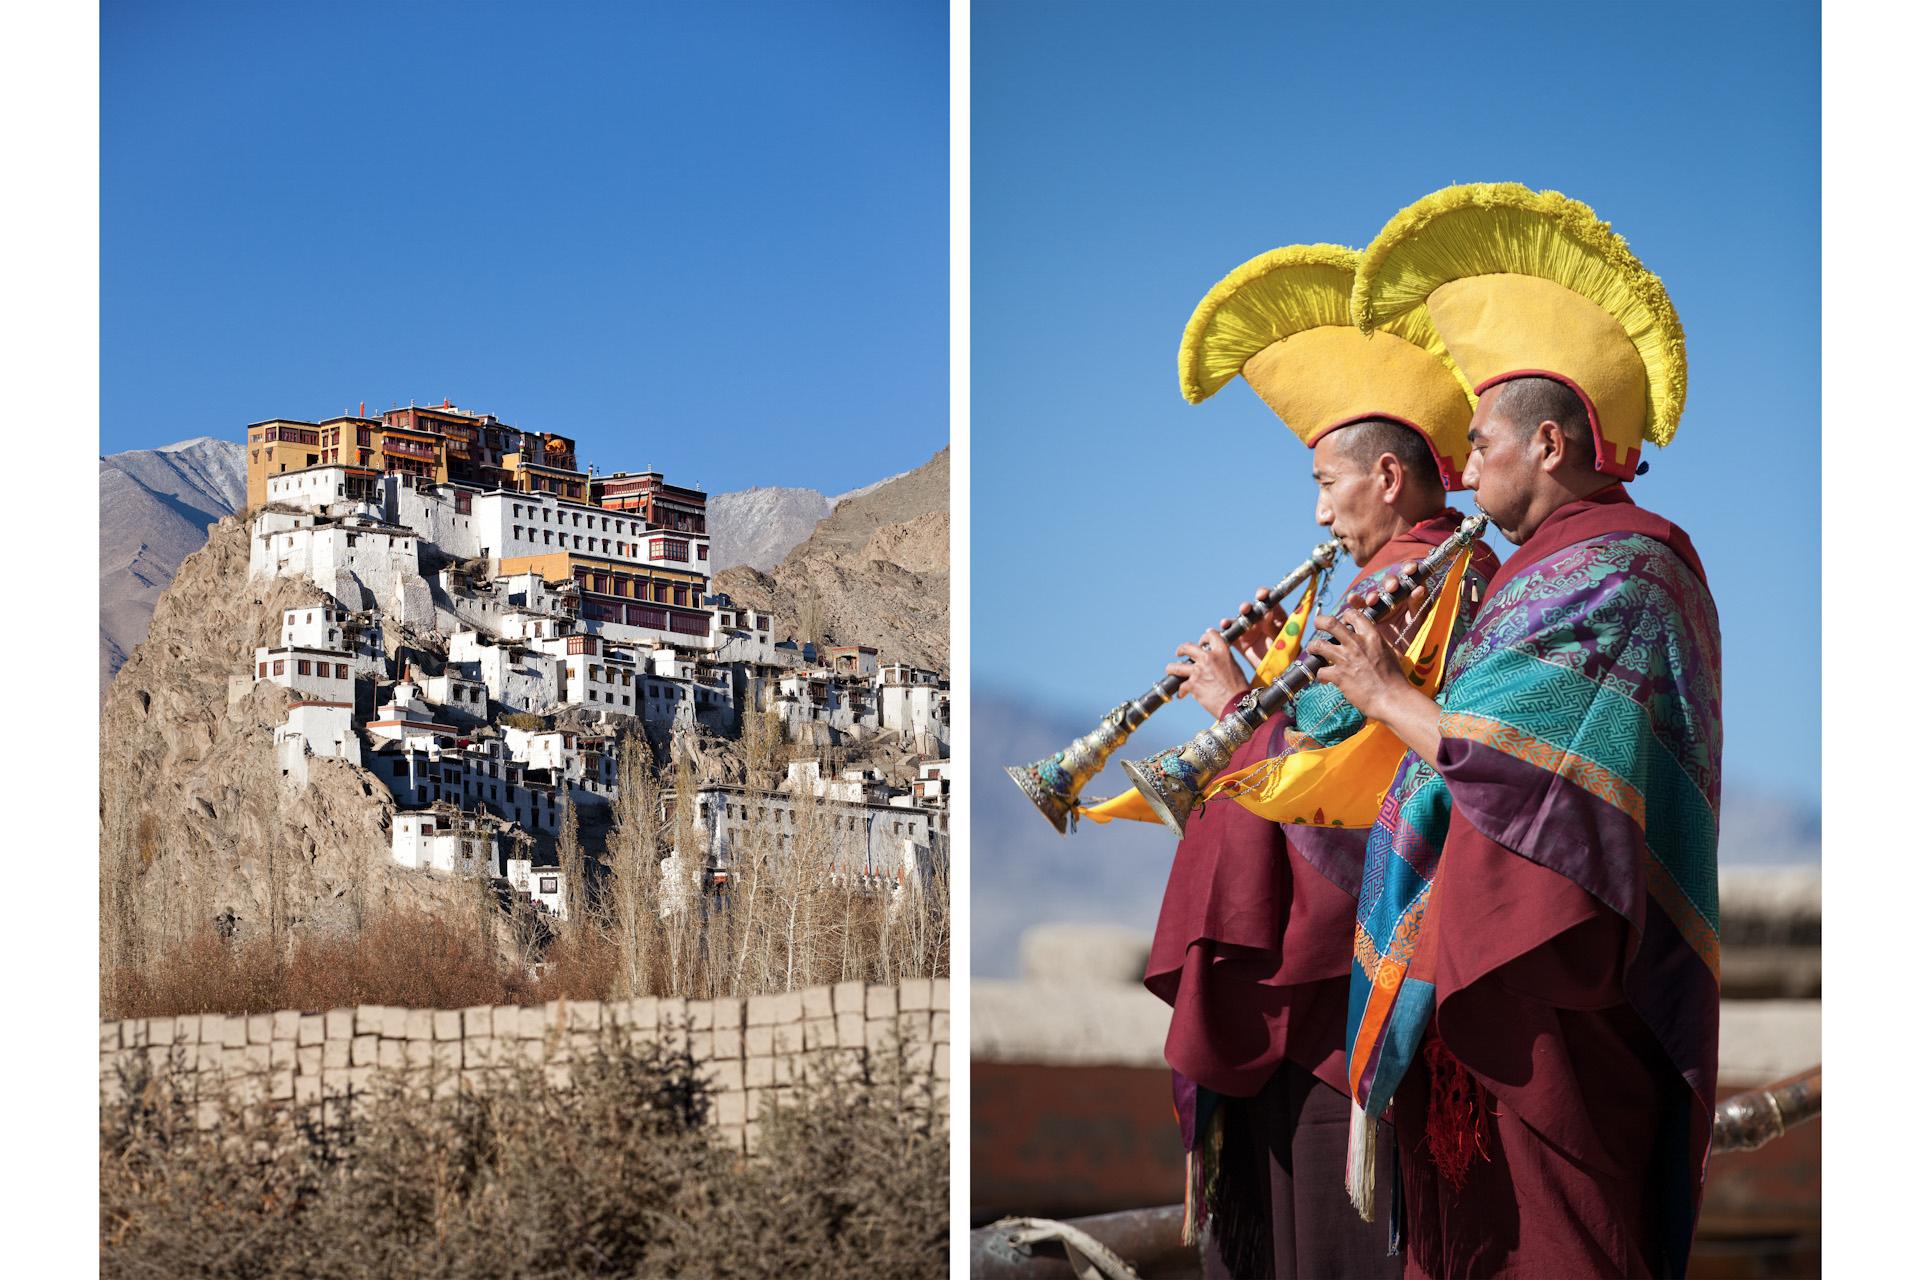 Jason_Bax_Travel_India-Ladakh-Thiksey-Buddhist-Monastery.JPG